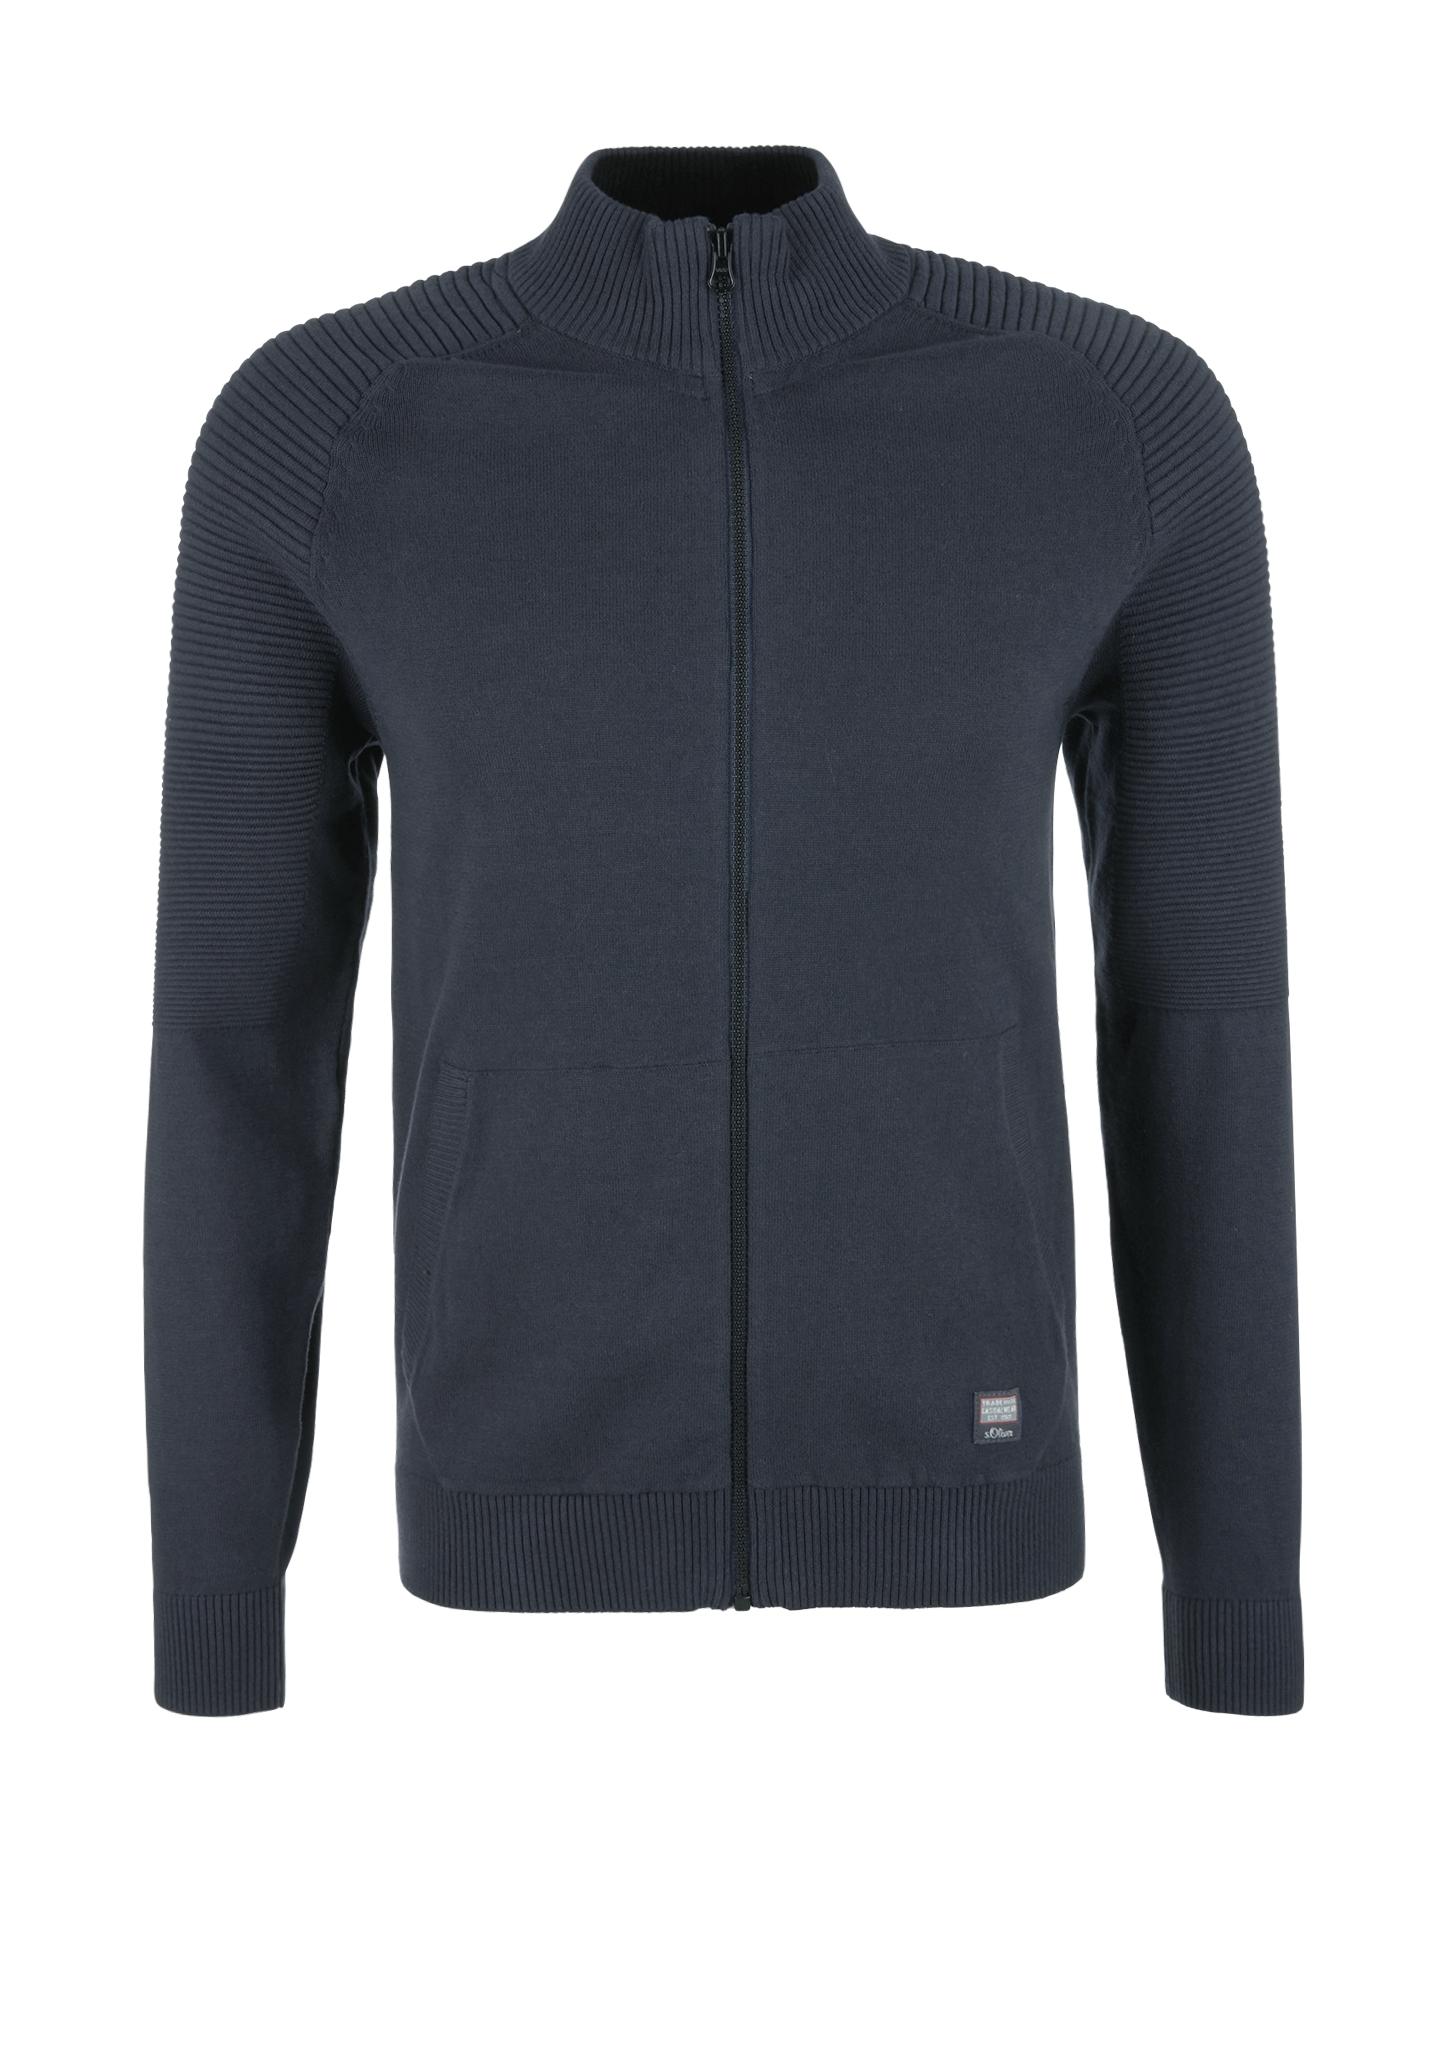 Strickjacke | Bekleidung > Strickjacken & Cardigans | Blau | 100% baumwolle | s.Oliver